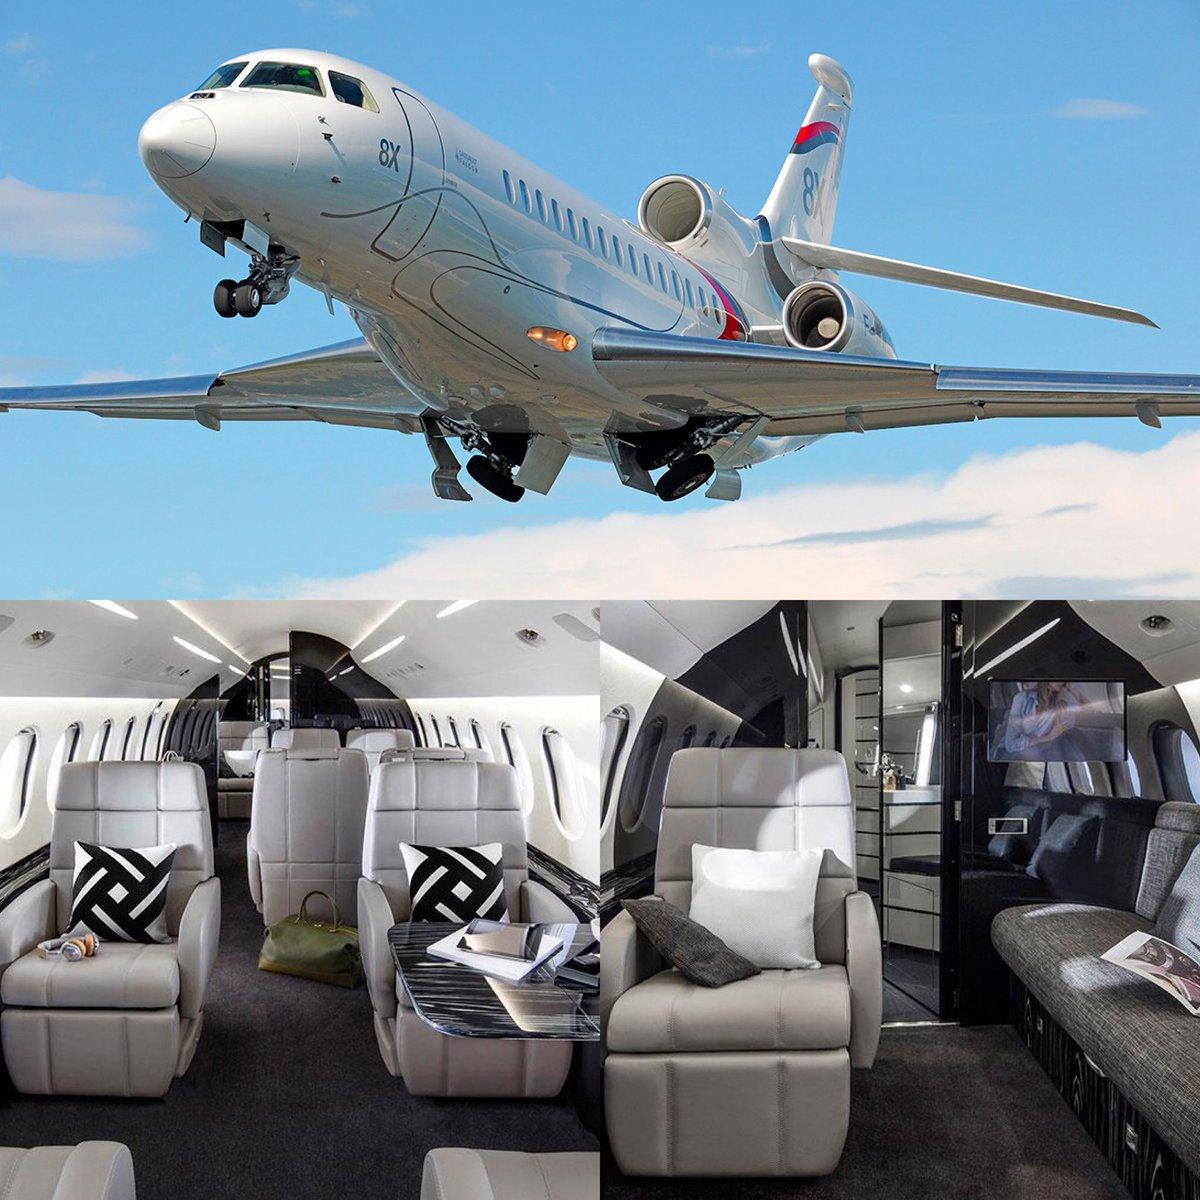 Airjet aviation great flight ✈️✈️✈️6,000 aircraft 🌎 worldwide first class flight reservation 7/24 call✈️💺 #airjethavacilik.# privatejet #aviation #luxury #avgeek #travel #jet #privatejetlife #privatejetcharter #businessjet #bizjet https://t.co/dTD4Ijzguk https://t.co/6XS9h6fpAs